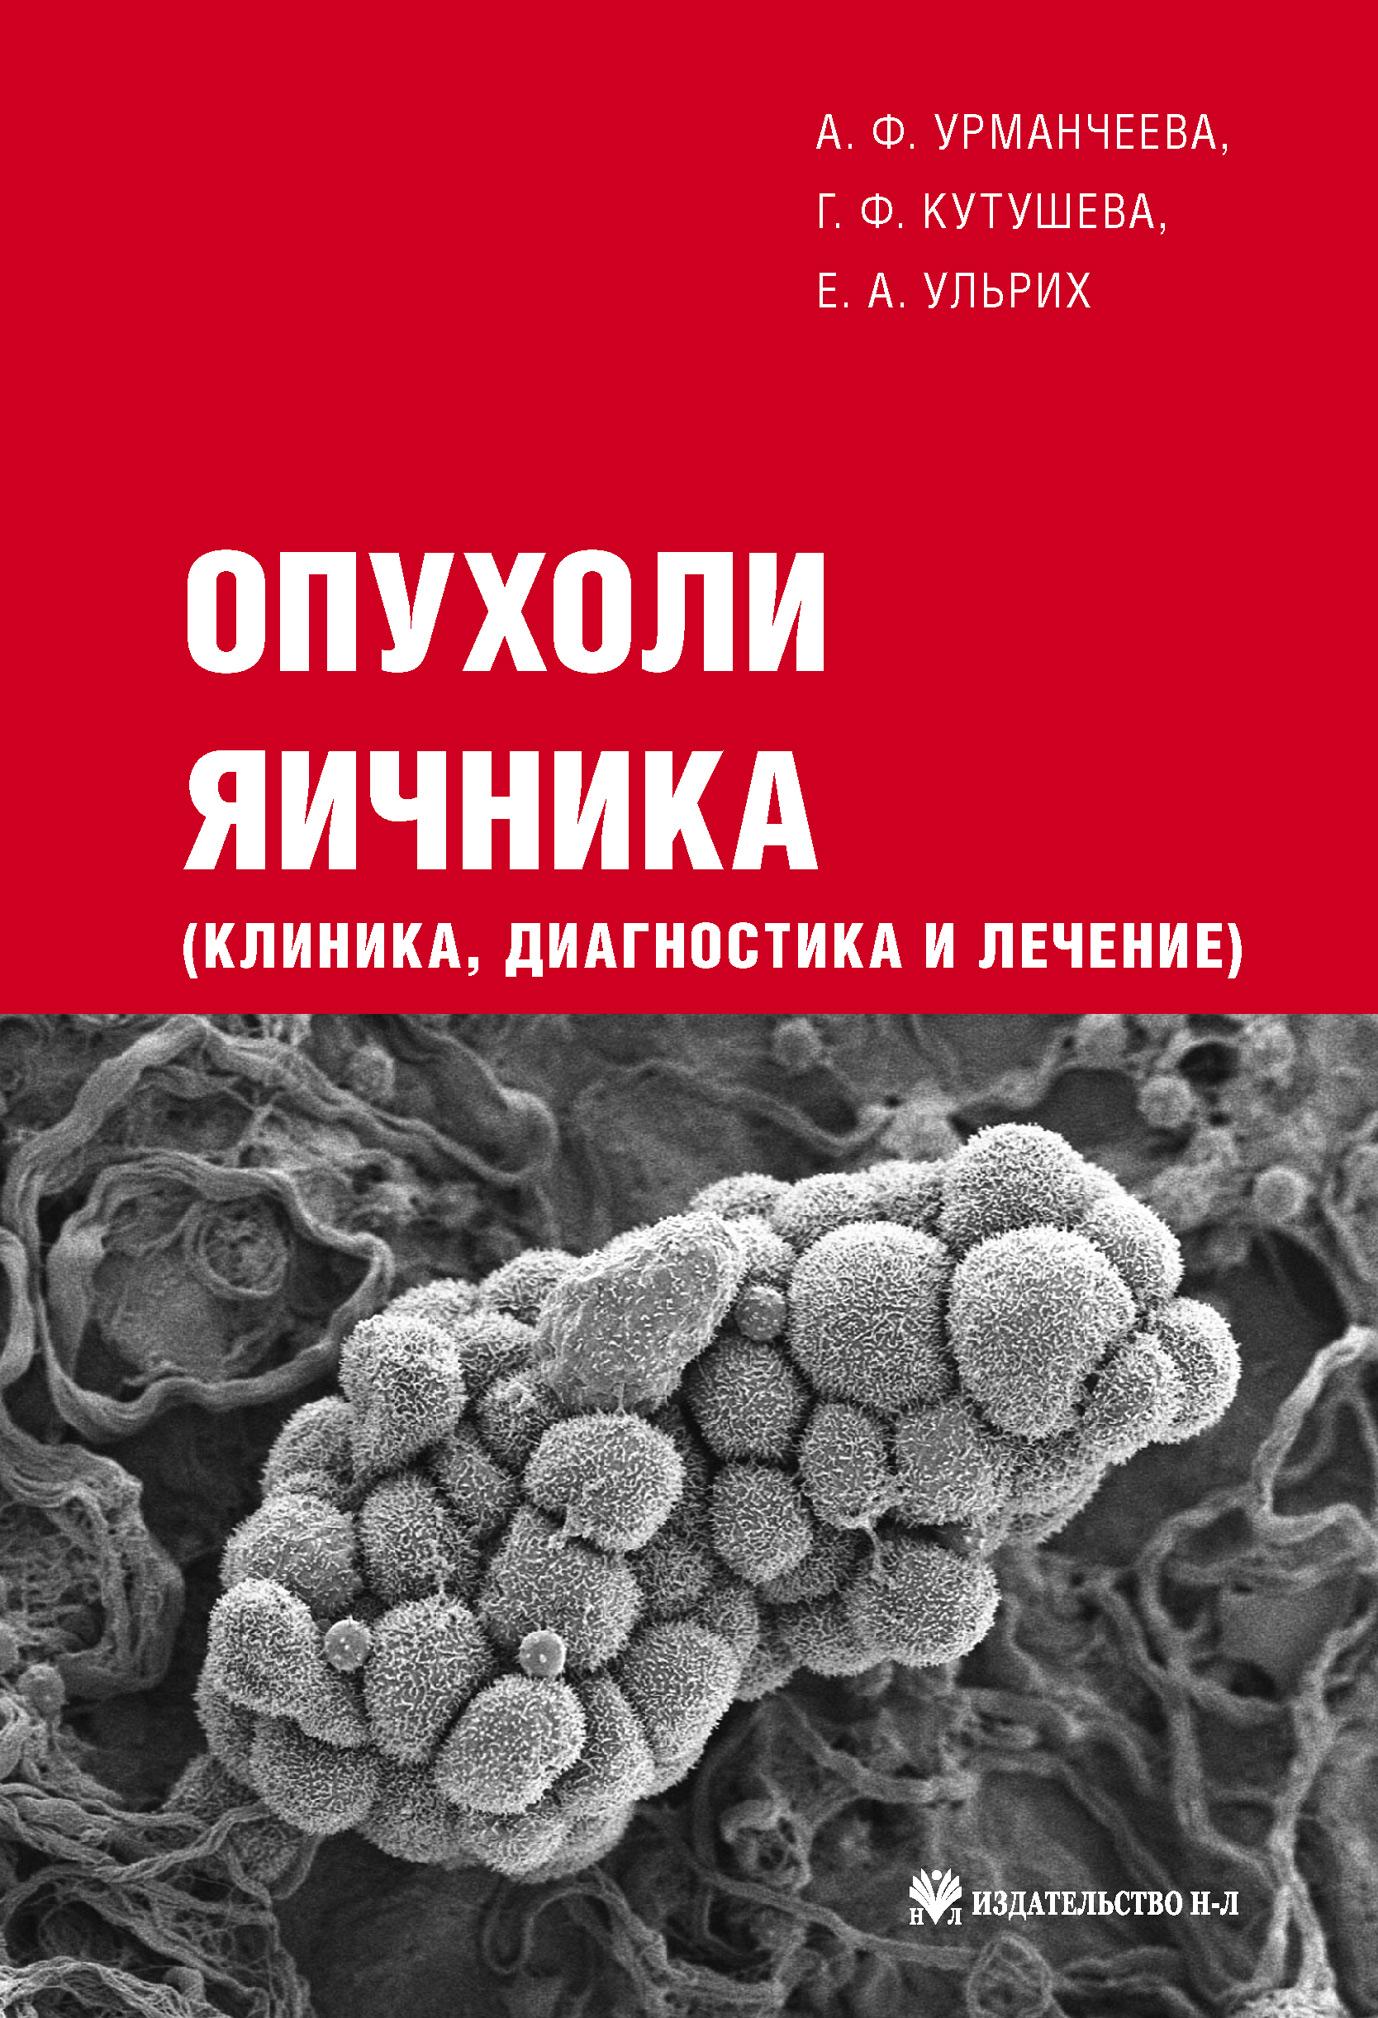 Е. А. Ульрих Опухоли яичника: клиника, диагностика и лечение